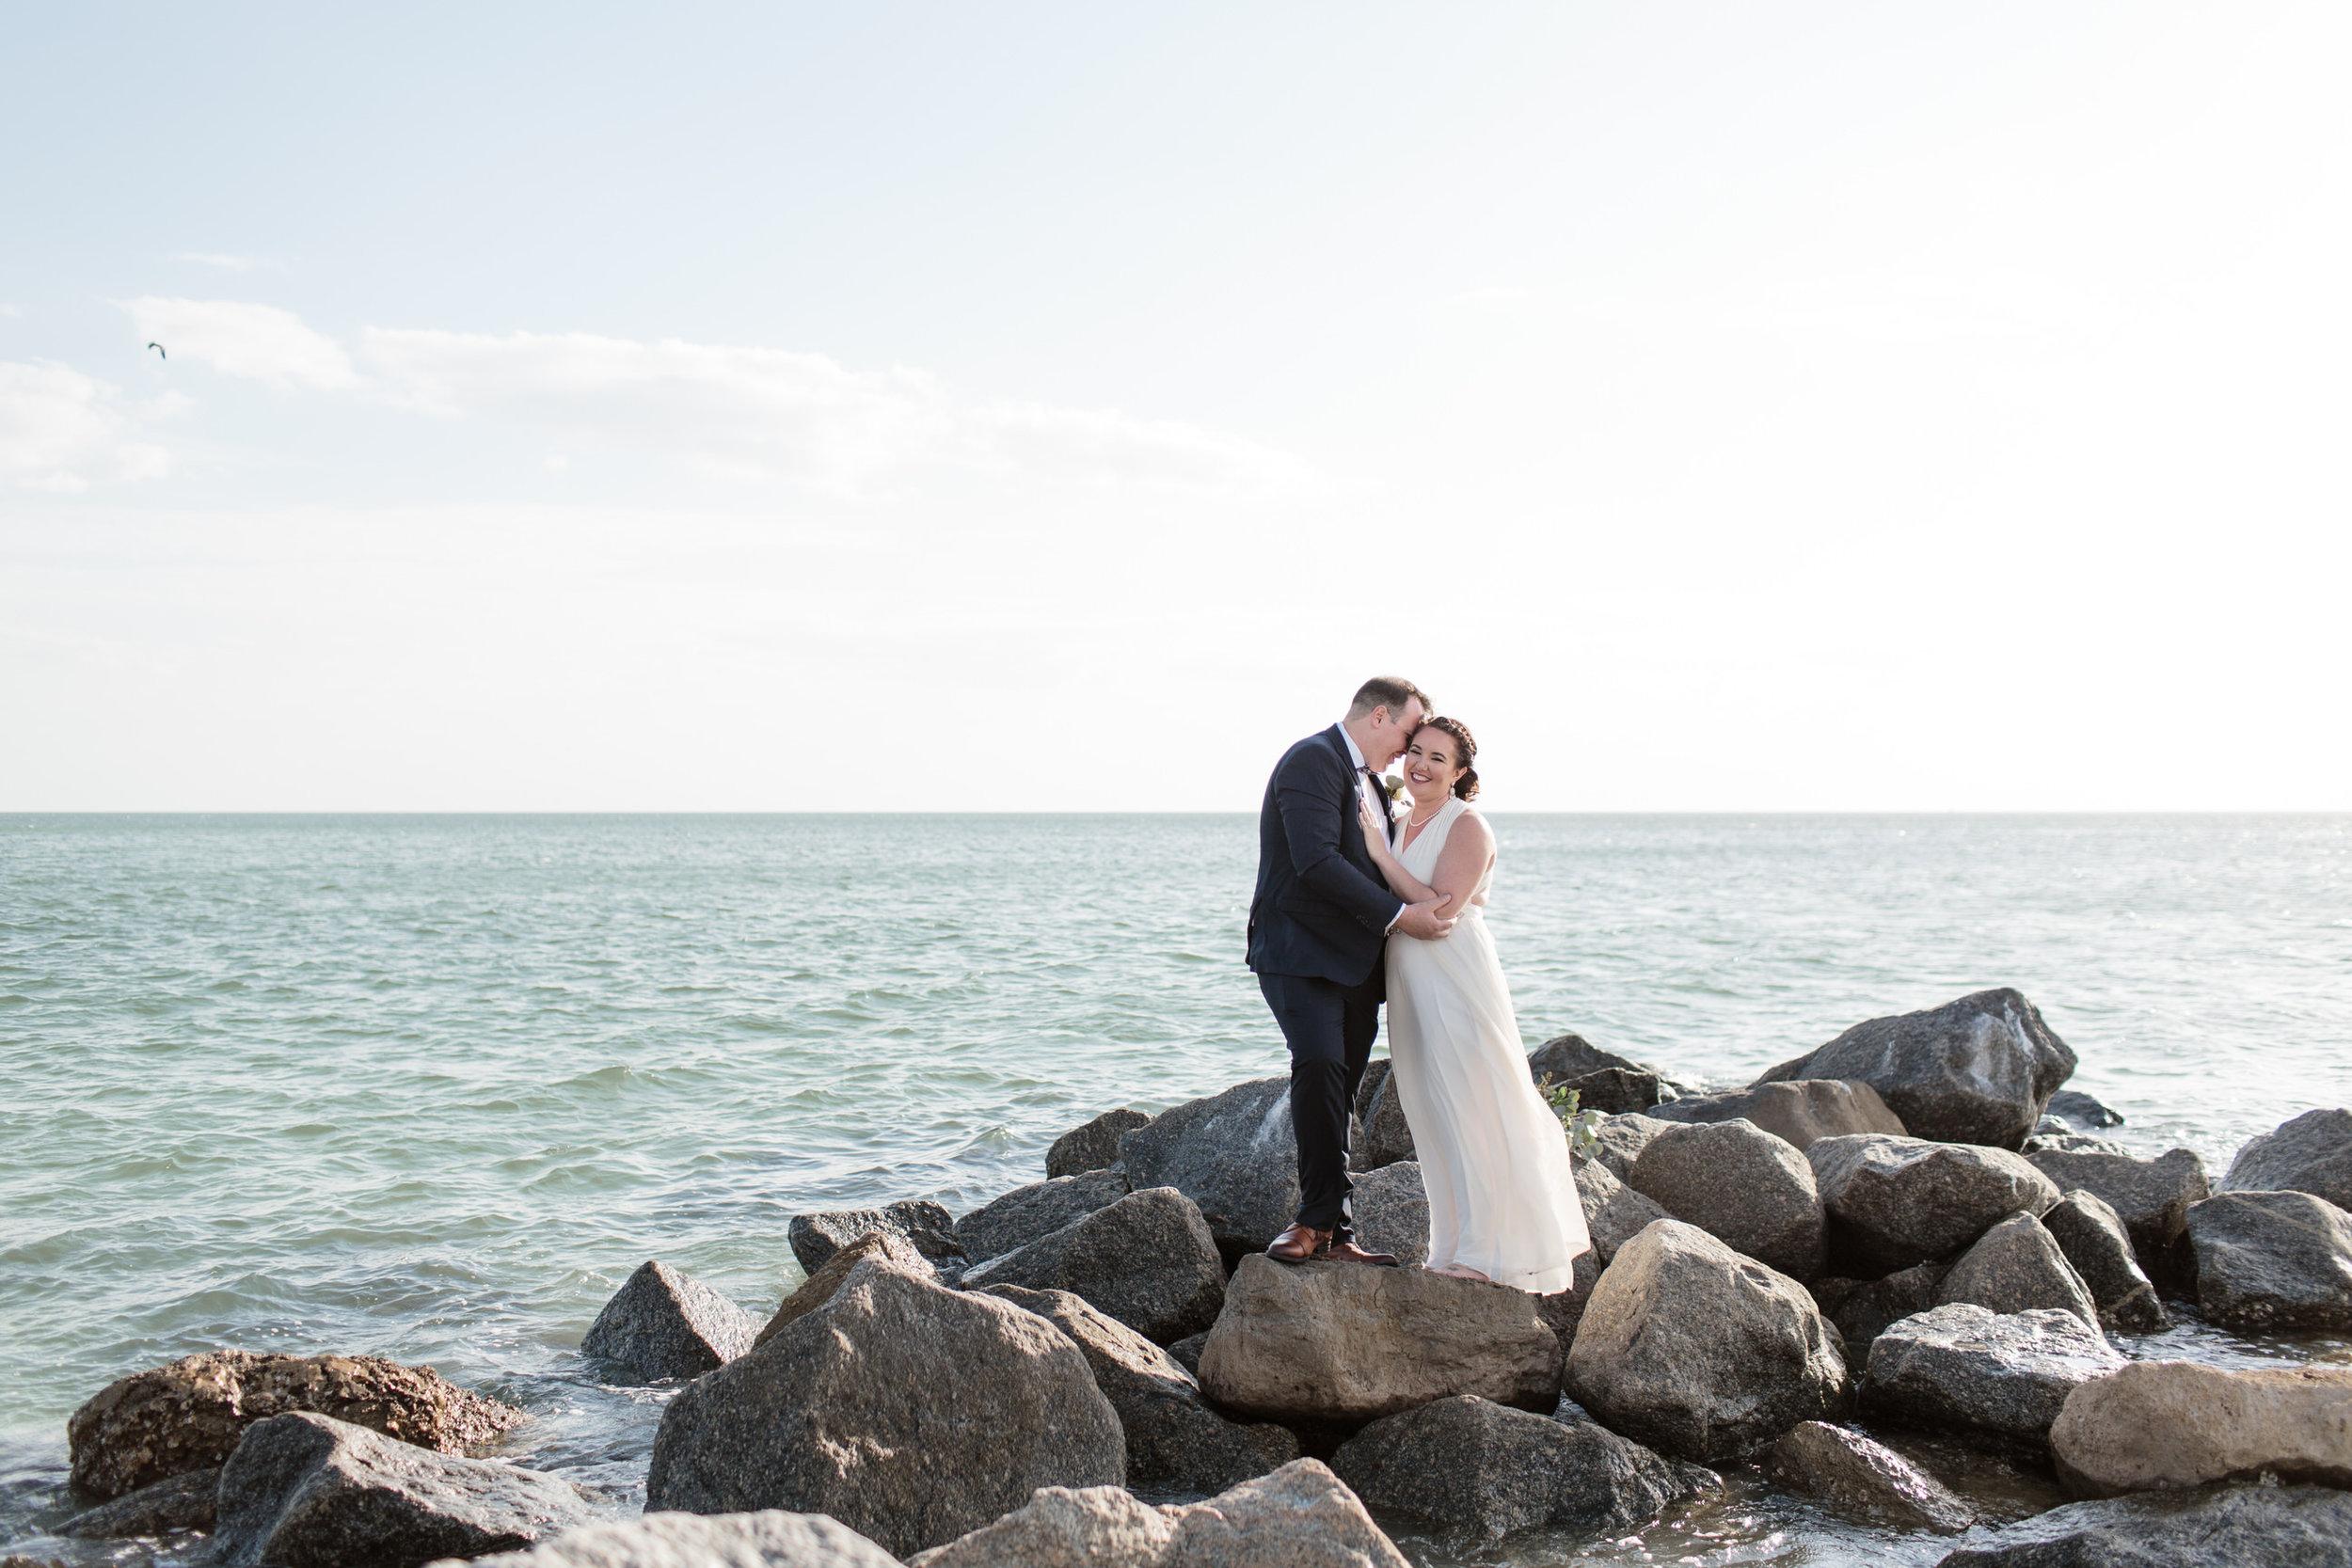 Beltran_Treasure_Island_Elopement_Tampa_Wedding_037-1.jpg